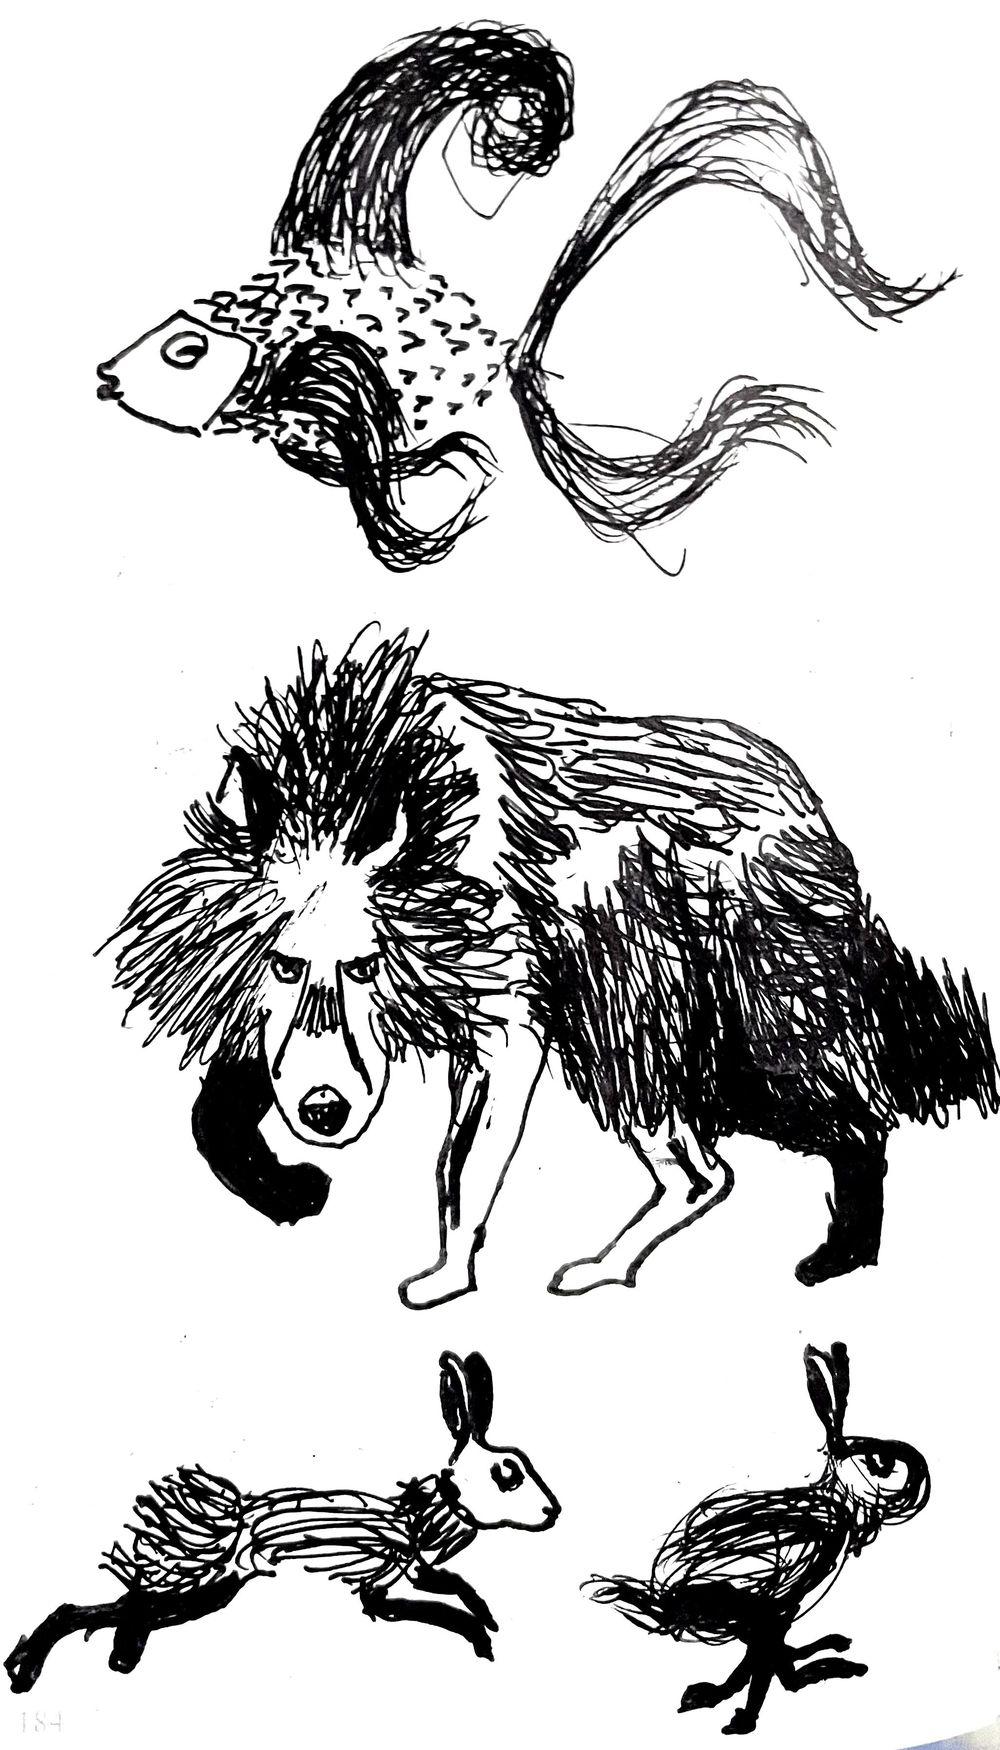 Animal illustrations - image 4 - student project